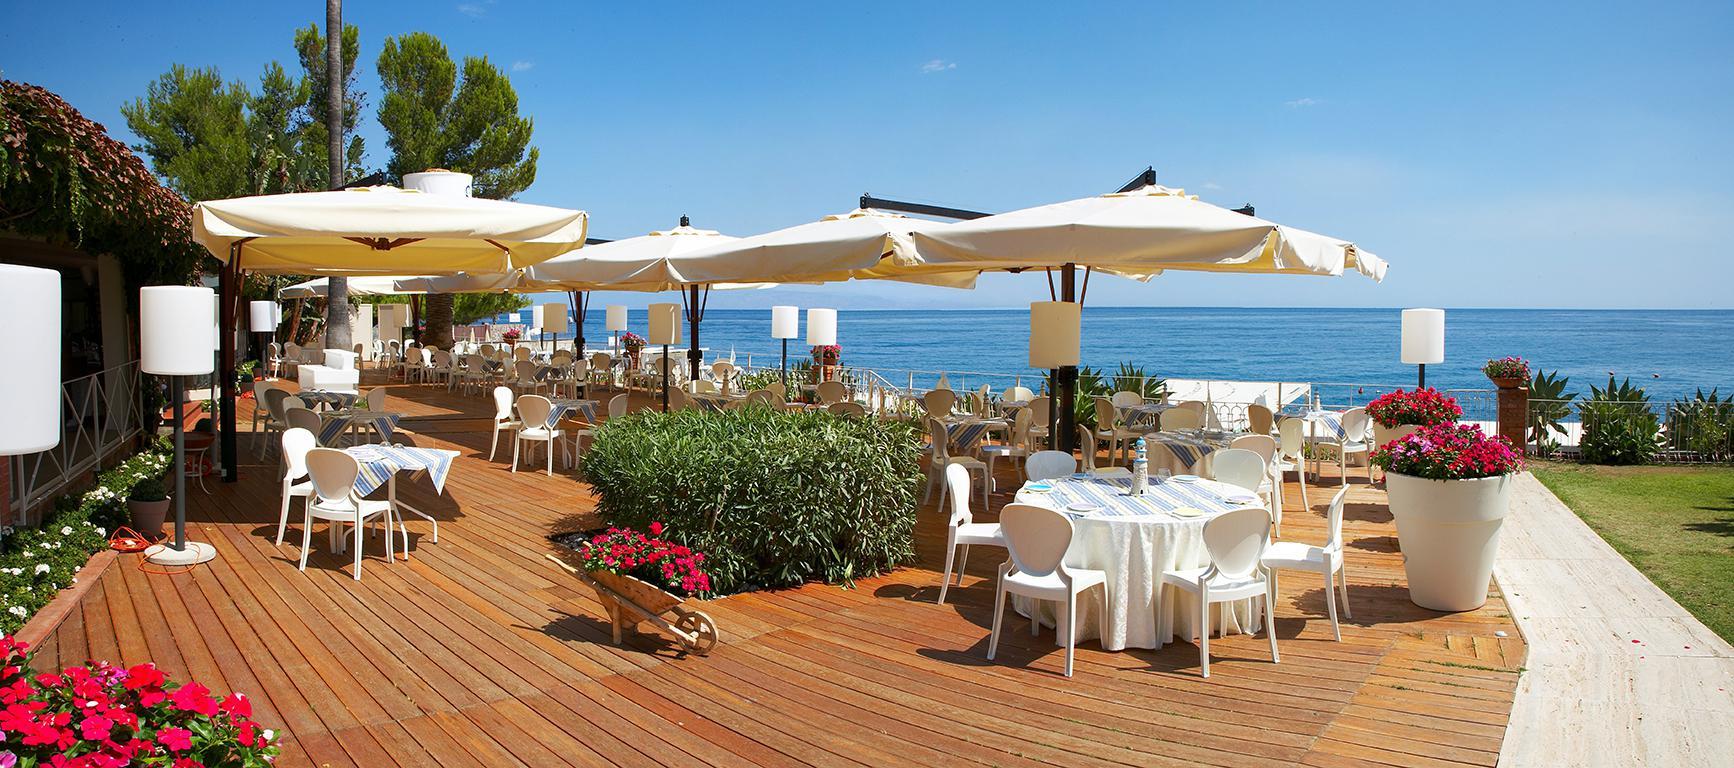 Vakantie Hotel Caparena in Taormina (Sicilië, Italië)